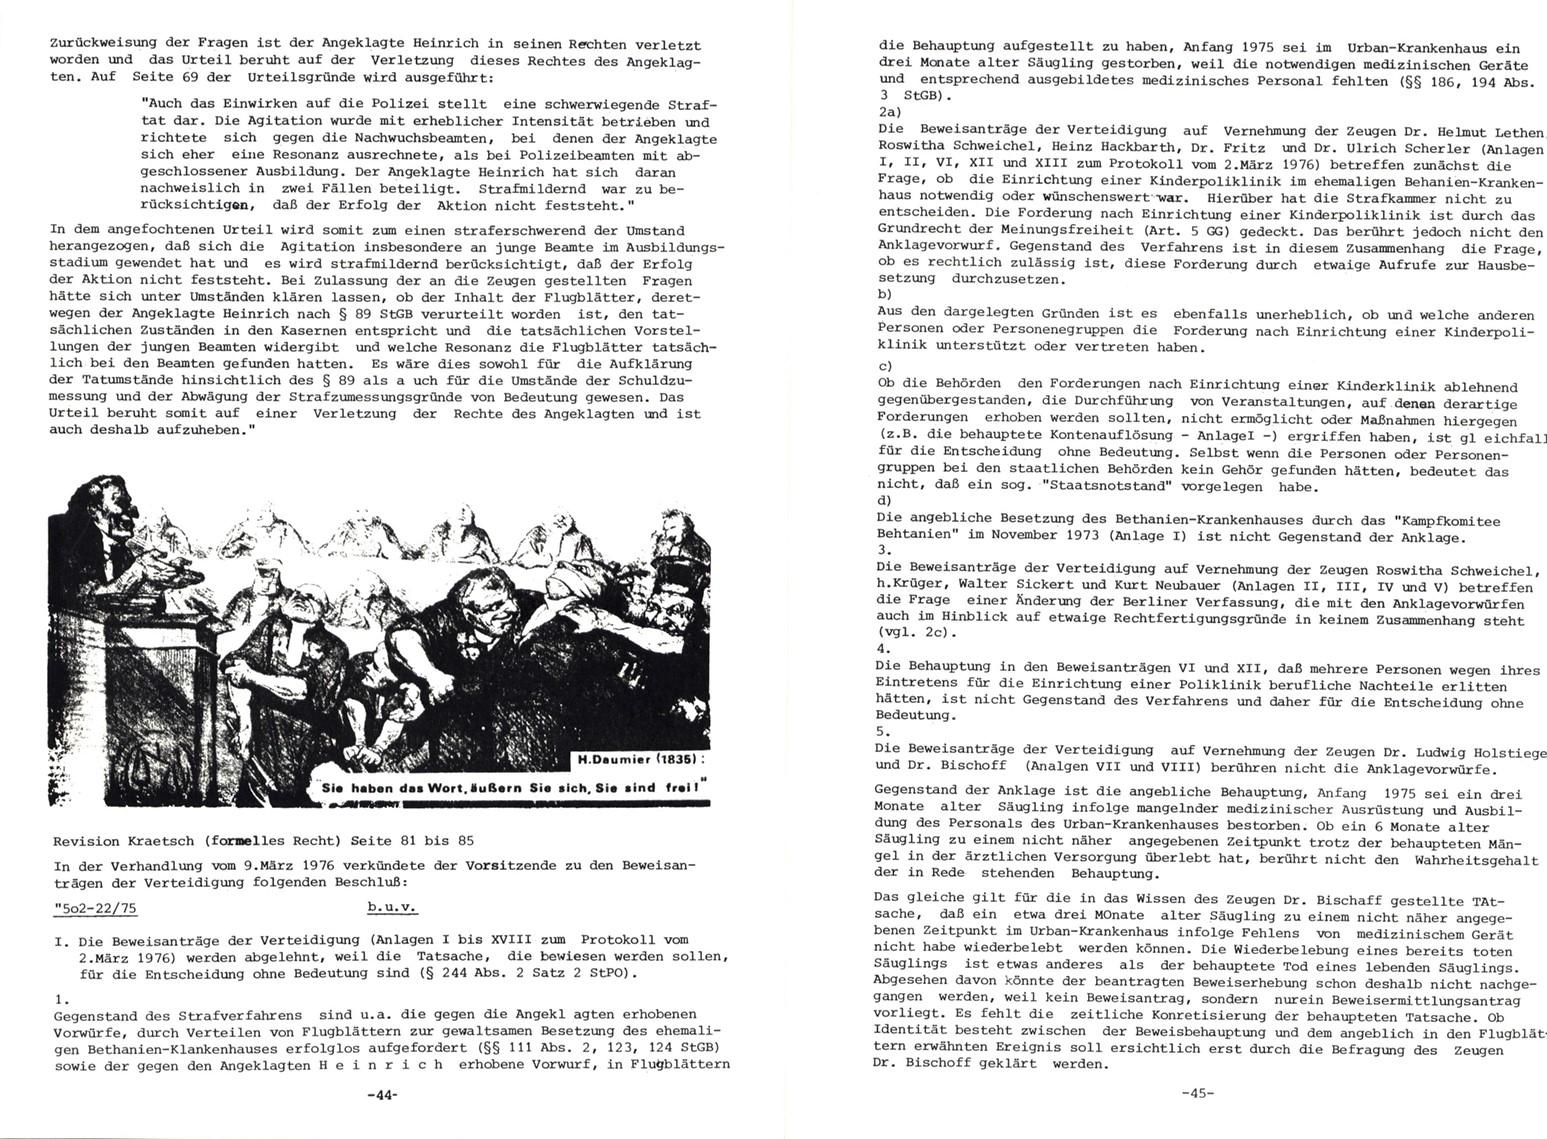 KPDAO_1976_Staatsschutzparagrafen_23